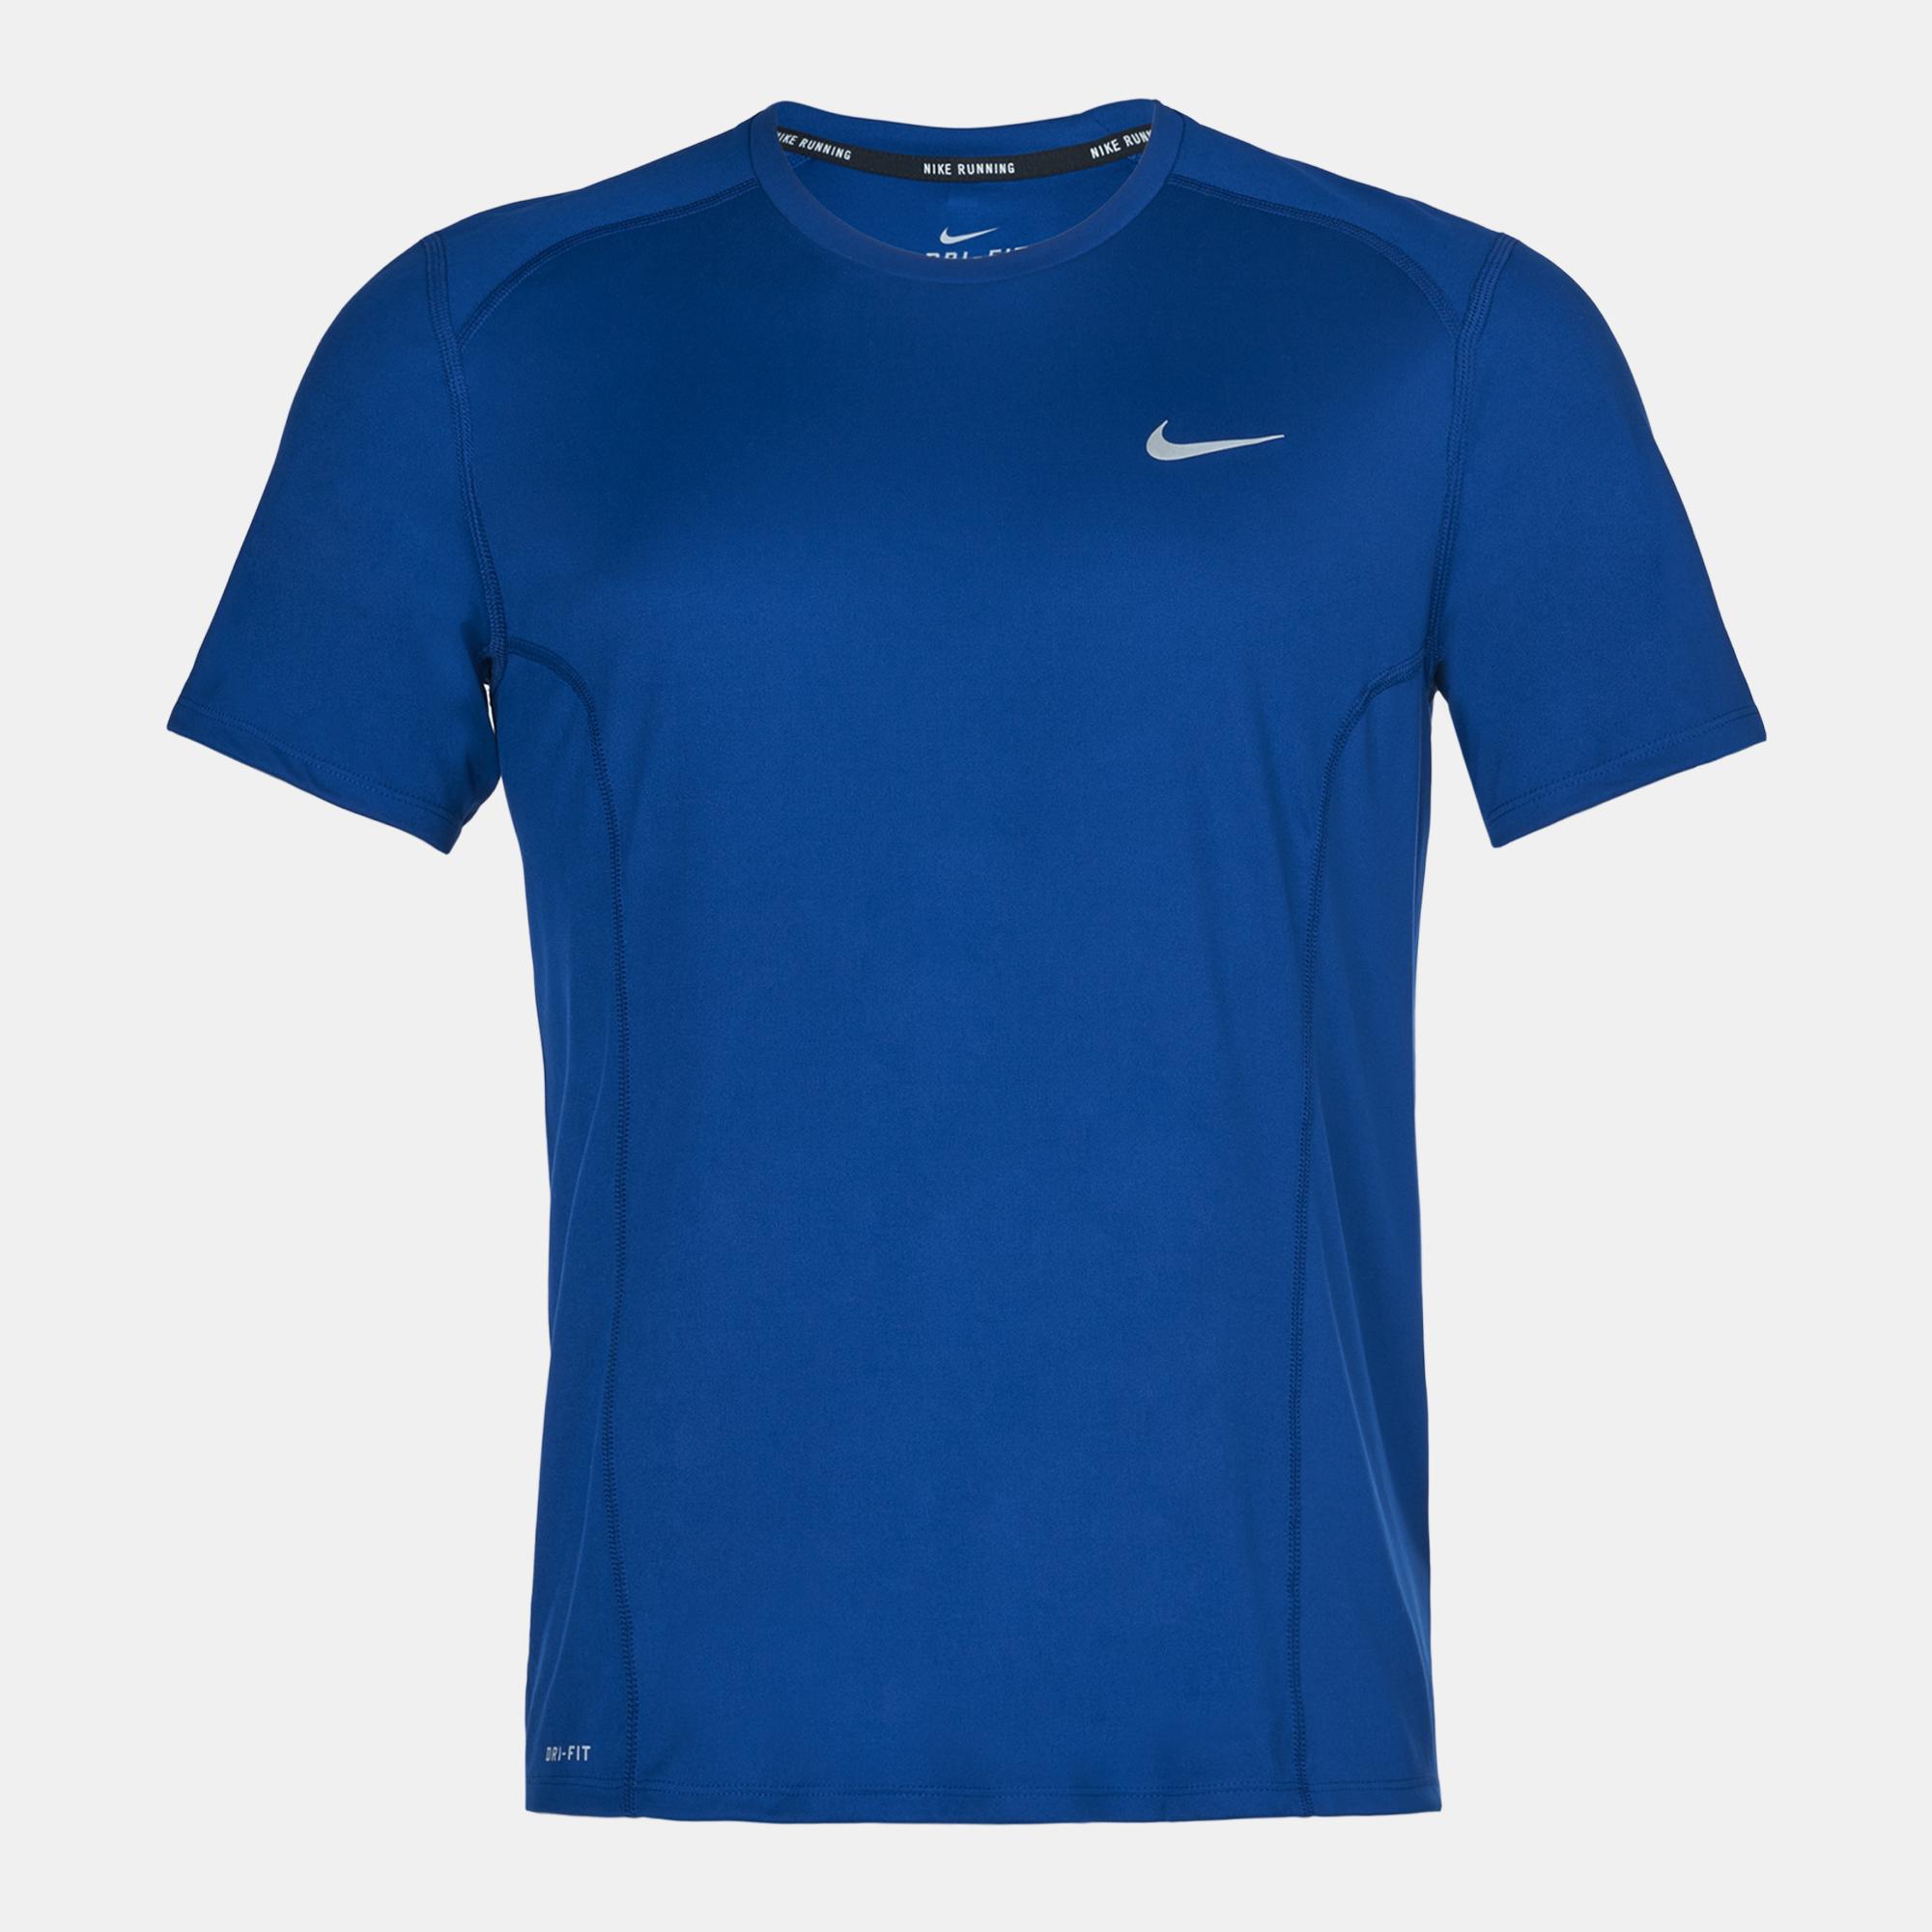 dac557e3 Nike Miler Long Sleeve Uv T Shirt Mens – EDGE Engineering and ...